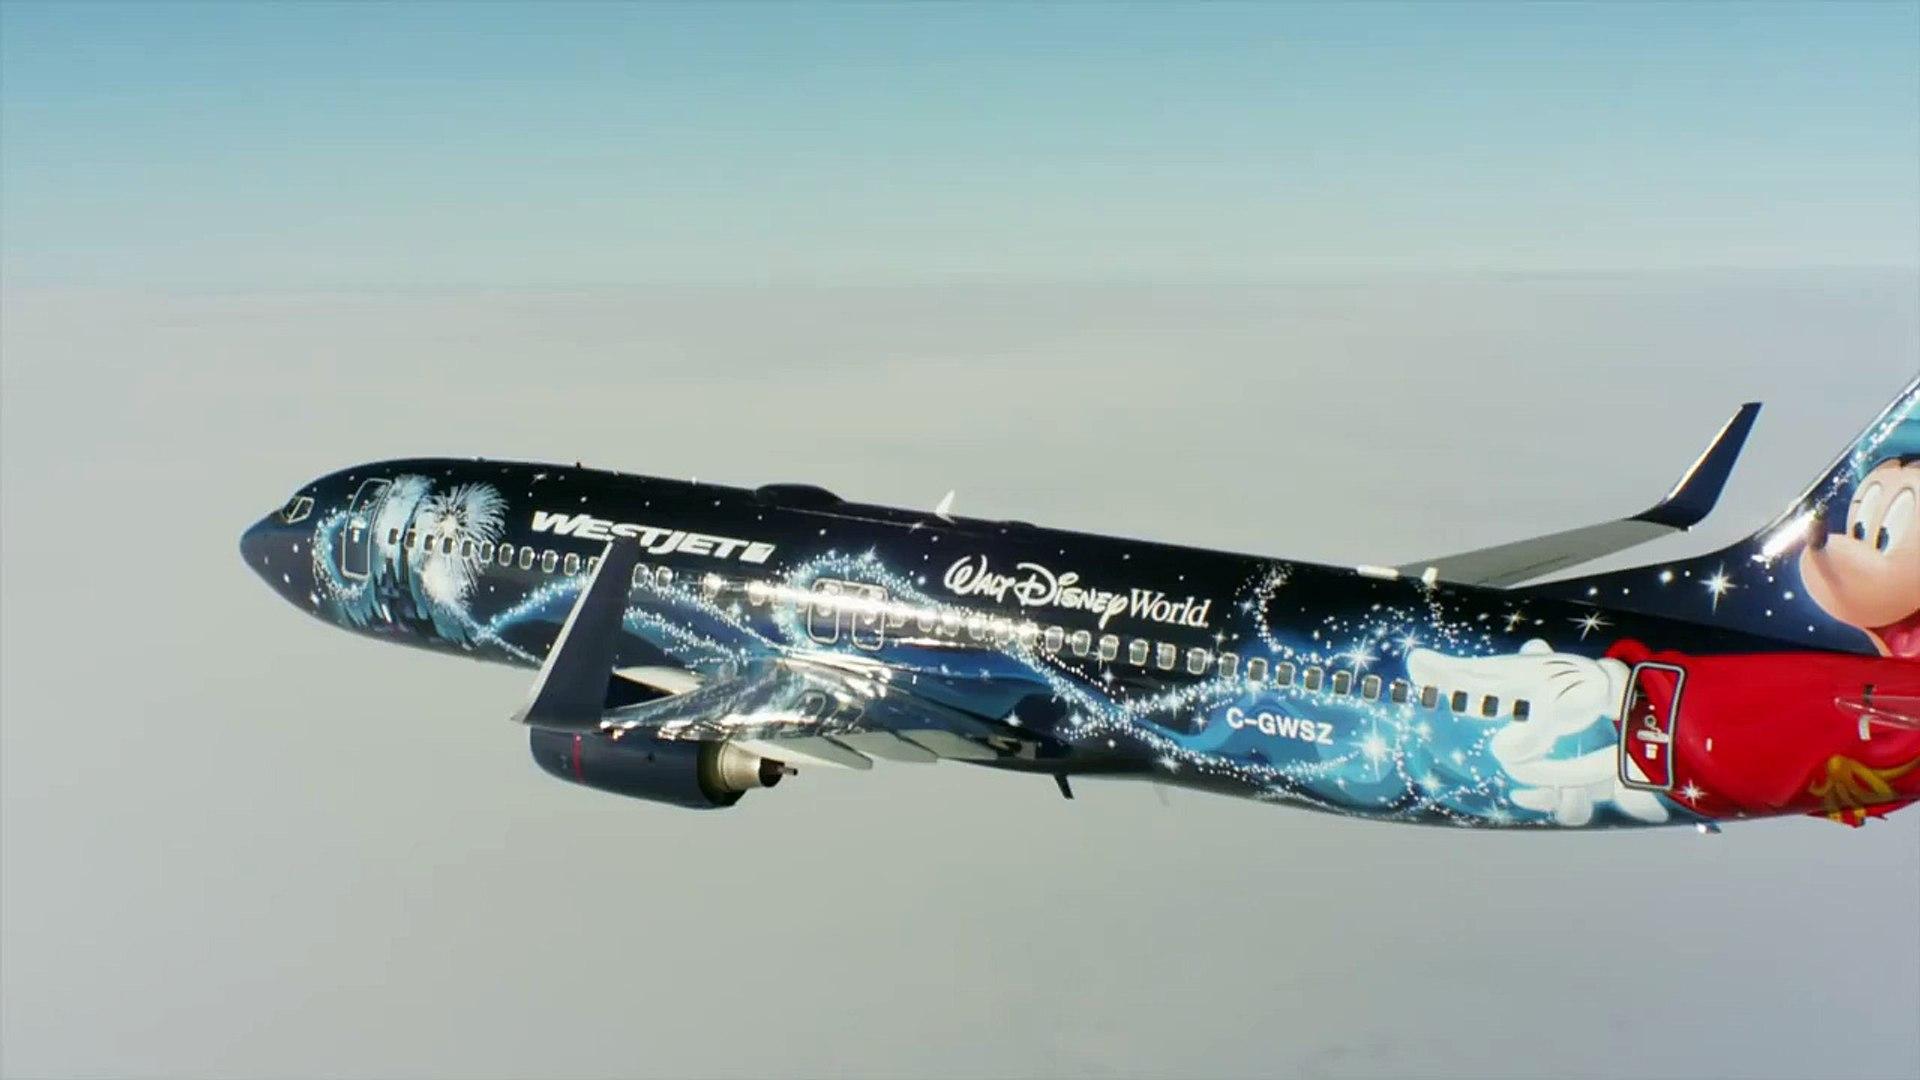 Air to air: WestJet #MagicPlane in flight